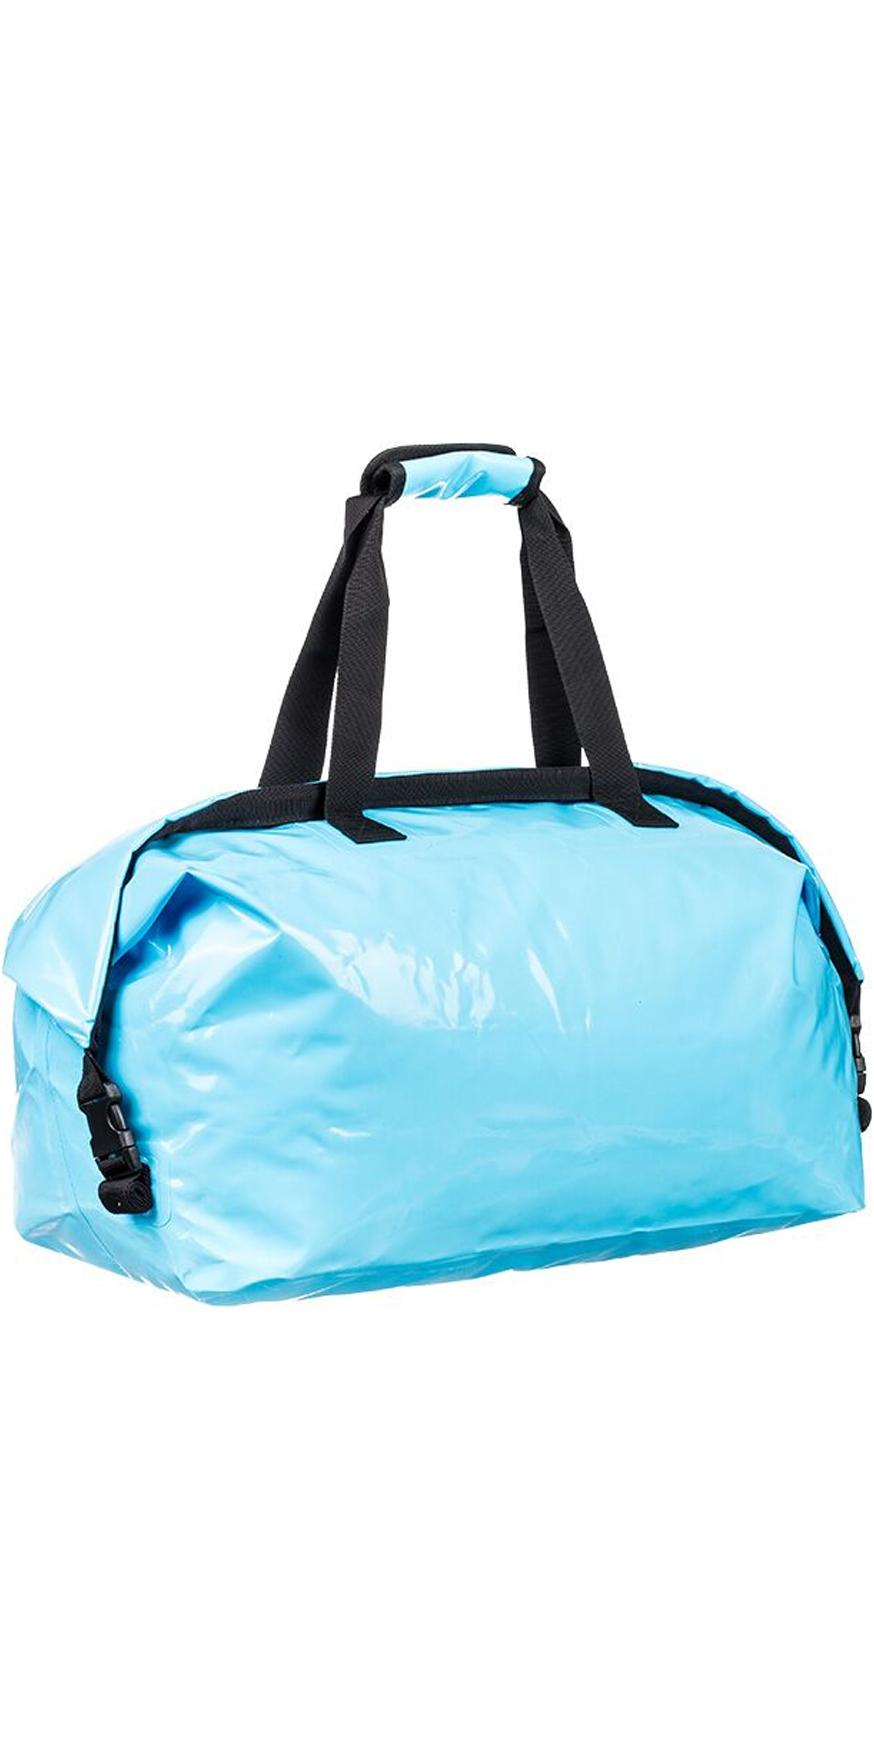 2019 Quiksilver Eurglass Wet Dry Duffel Bag 29.5L Blue EGL0DUFFEL